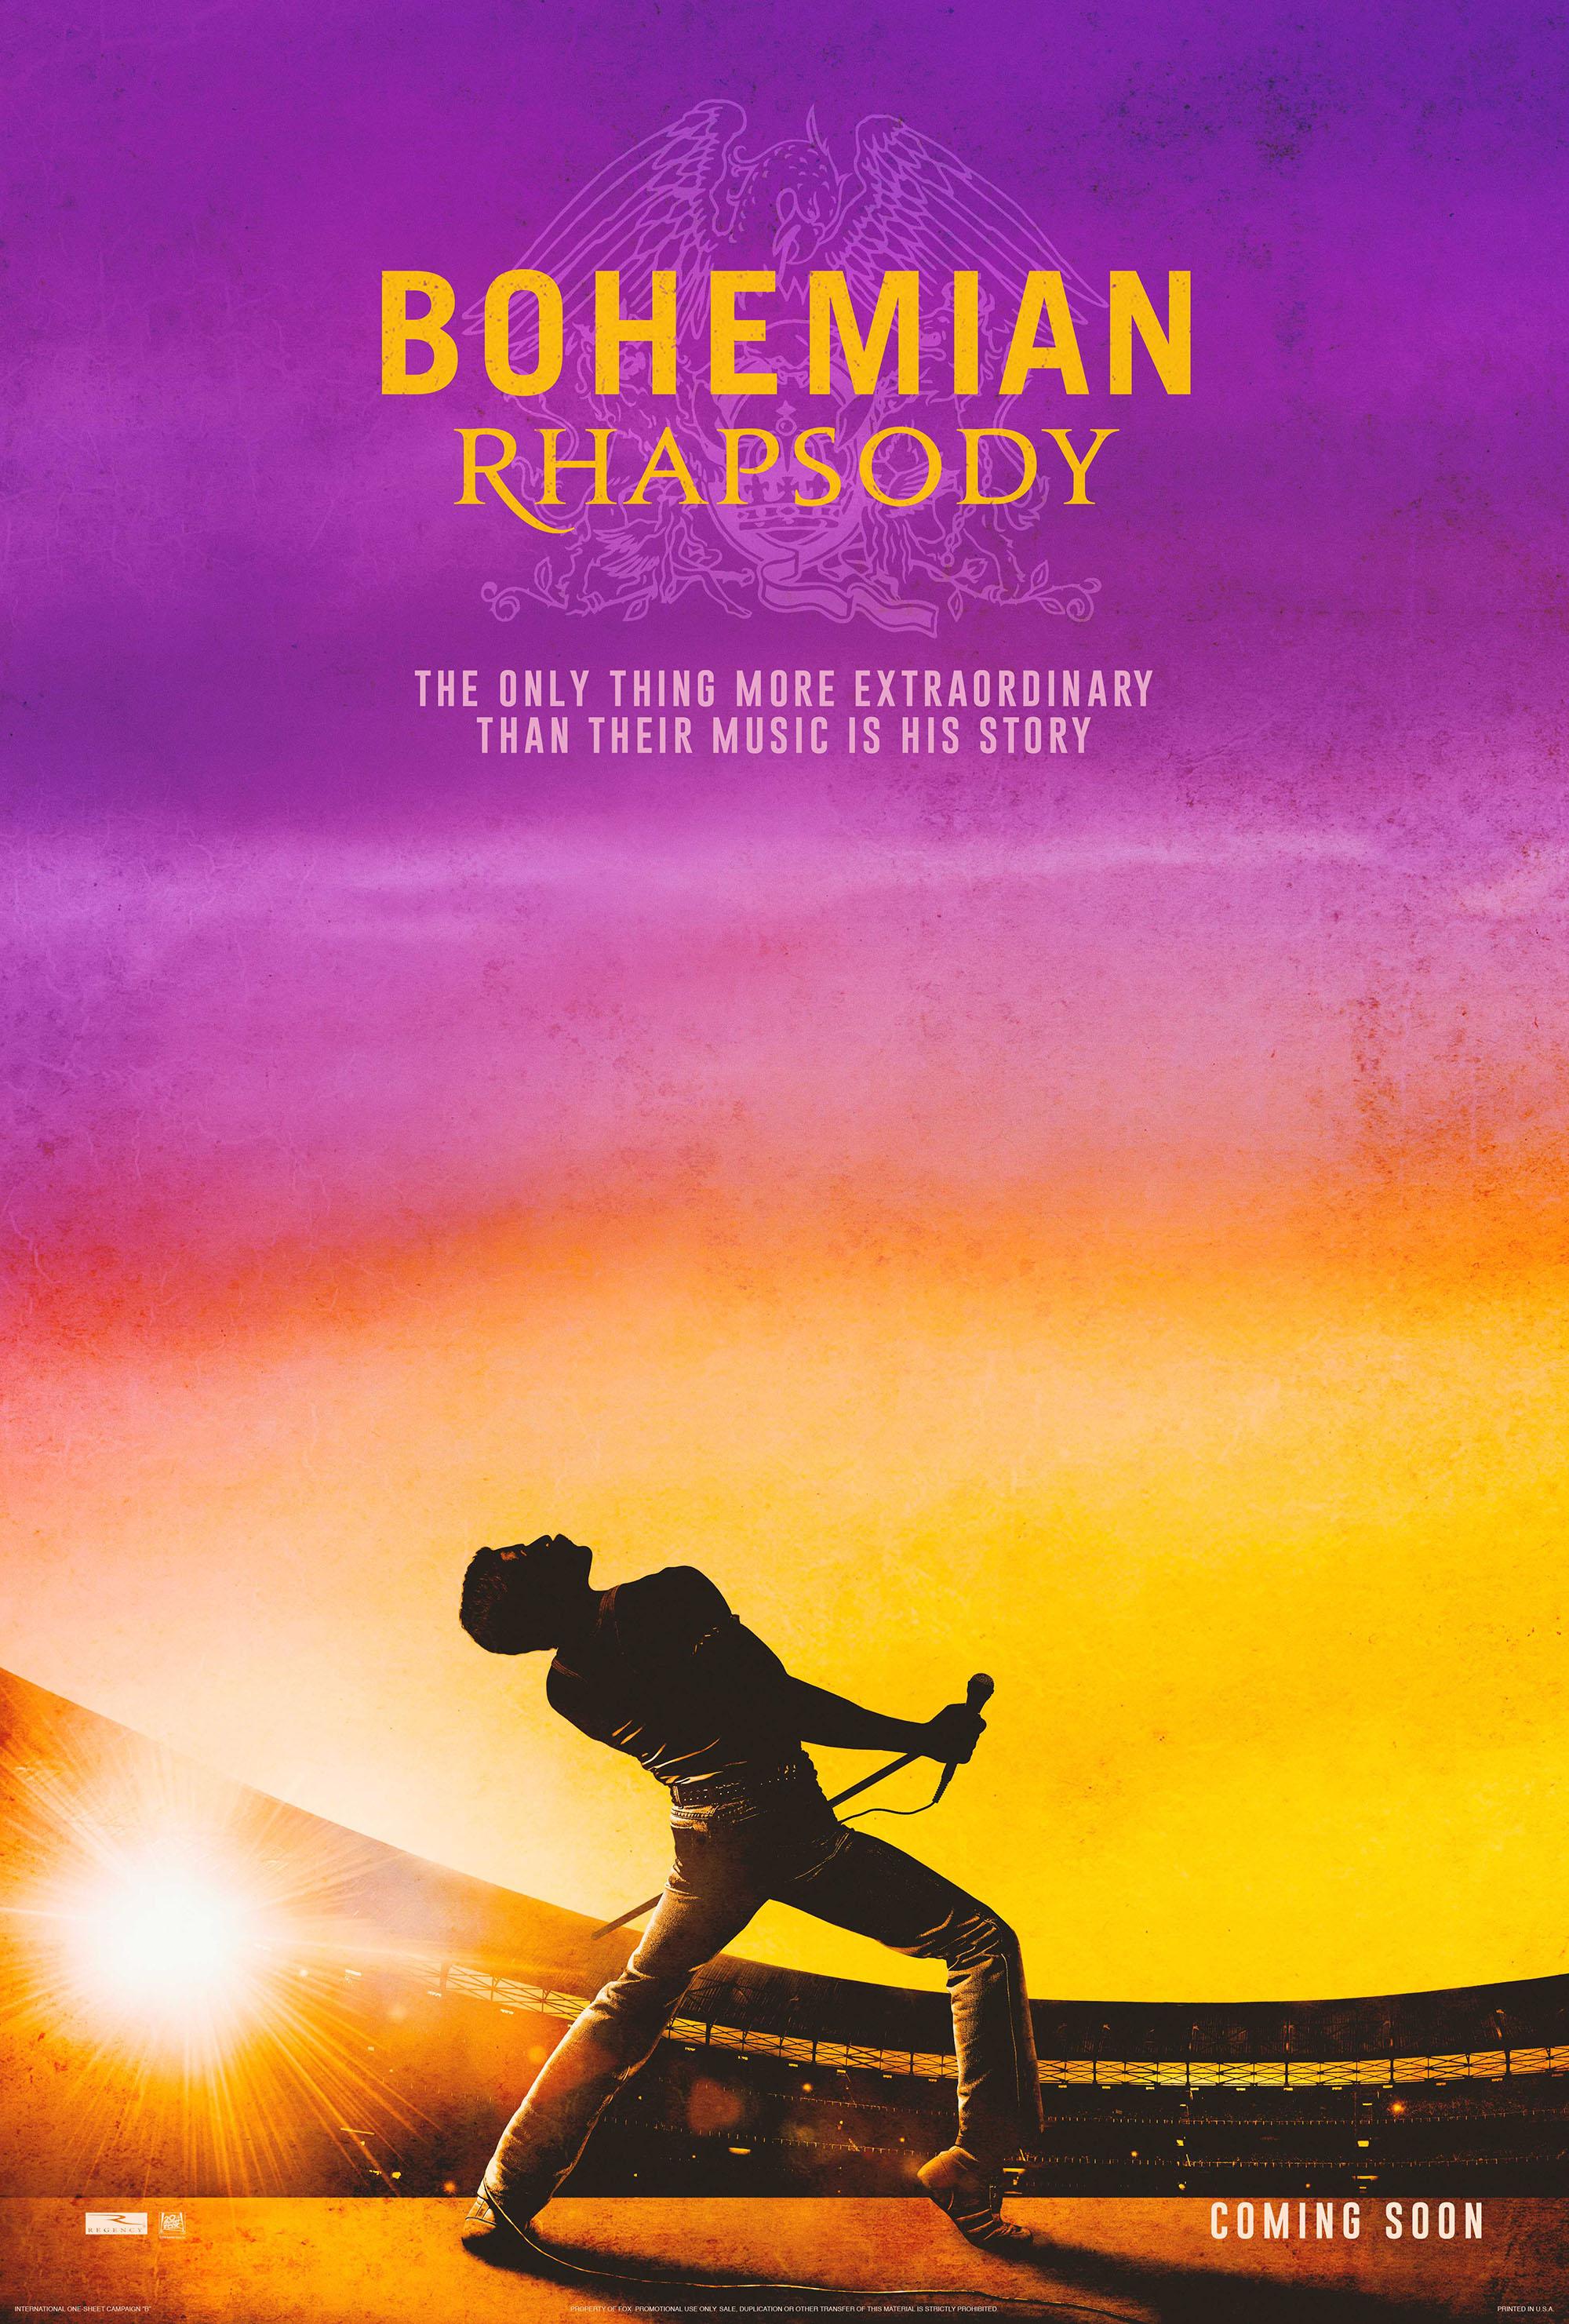 bohemian rhapsody-teaser poster